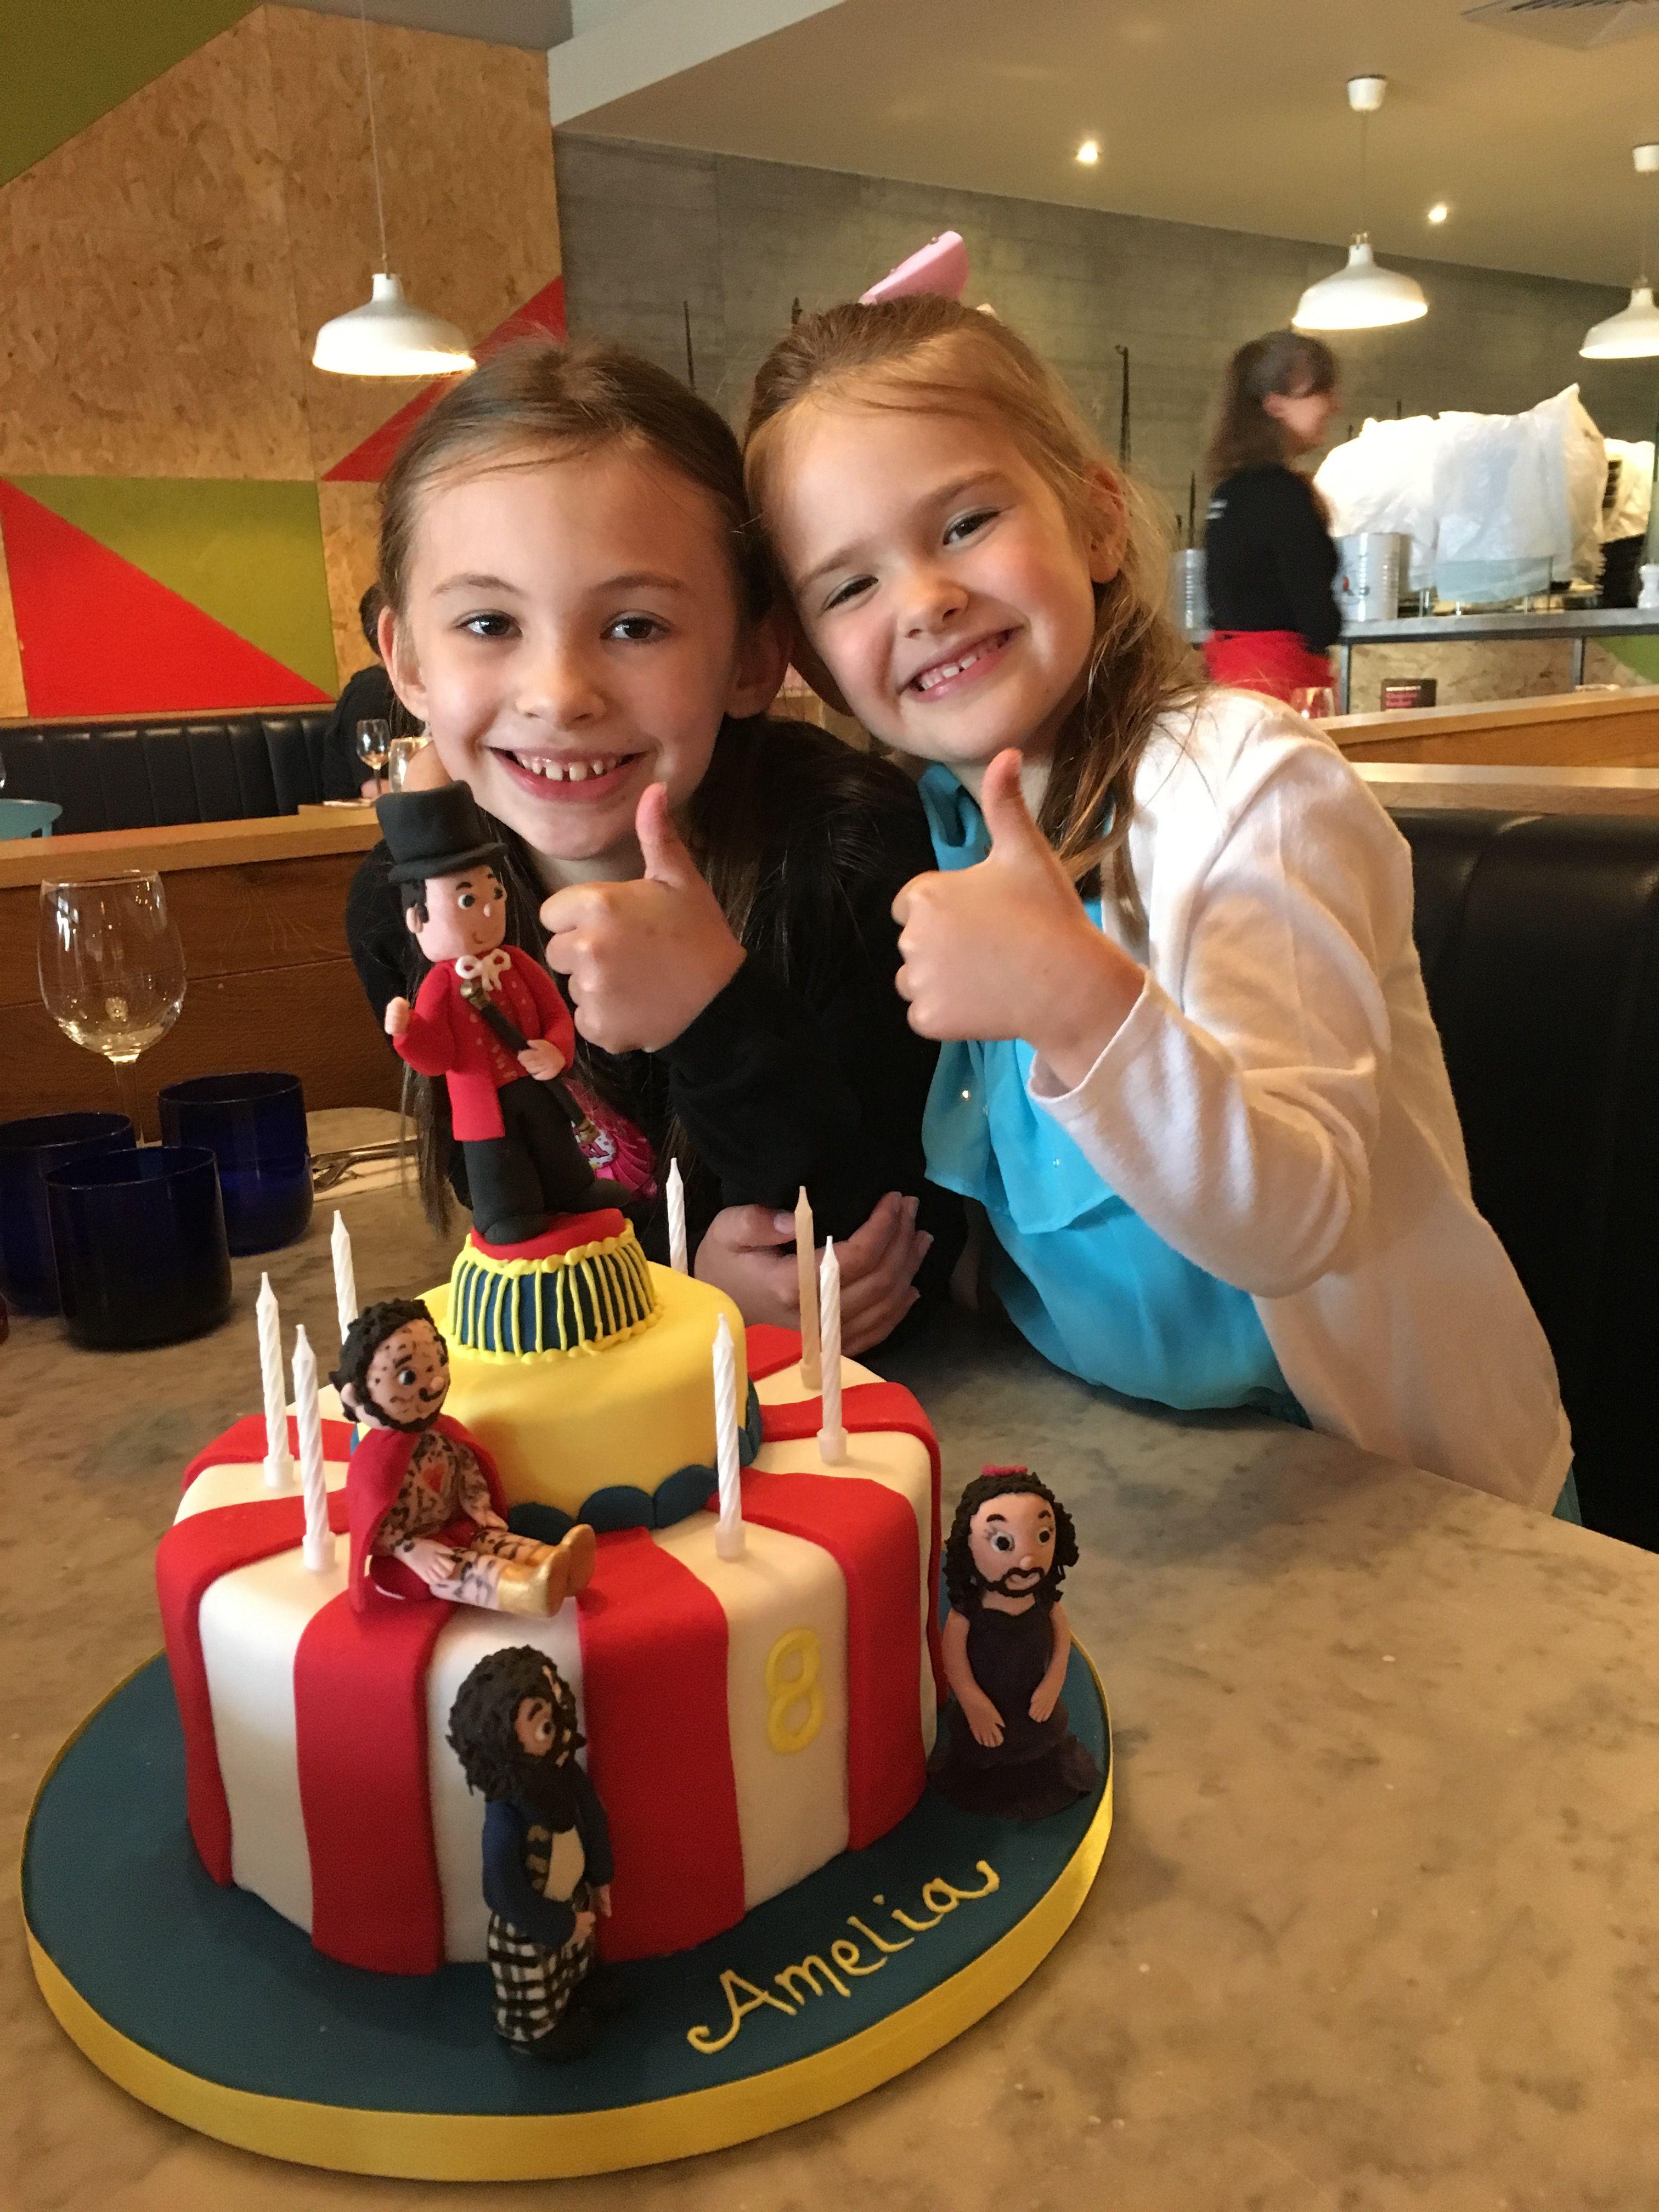 Greatest Showman Cake Cake Ideas For My Girls Cake